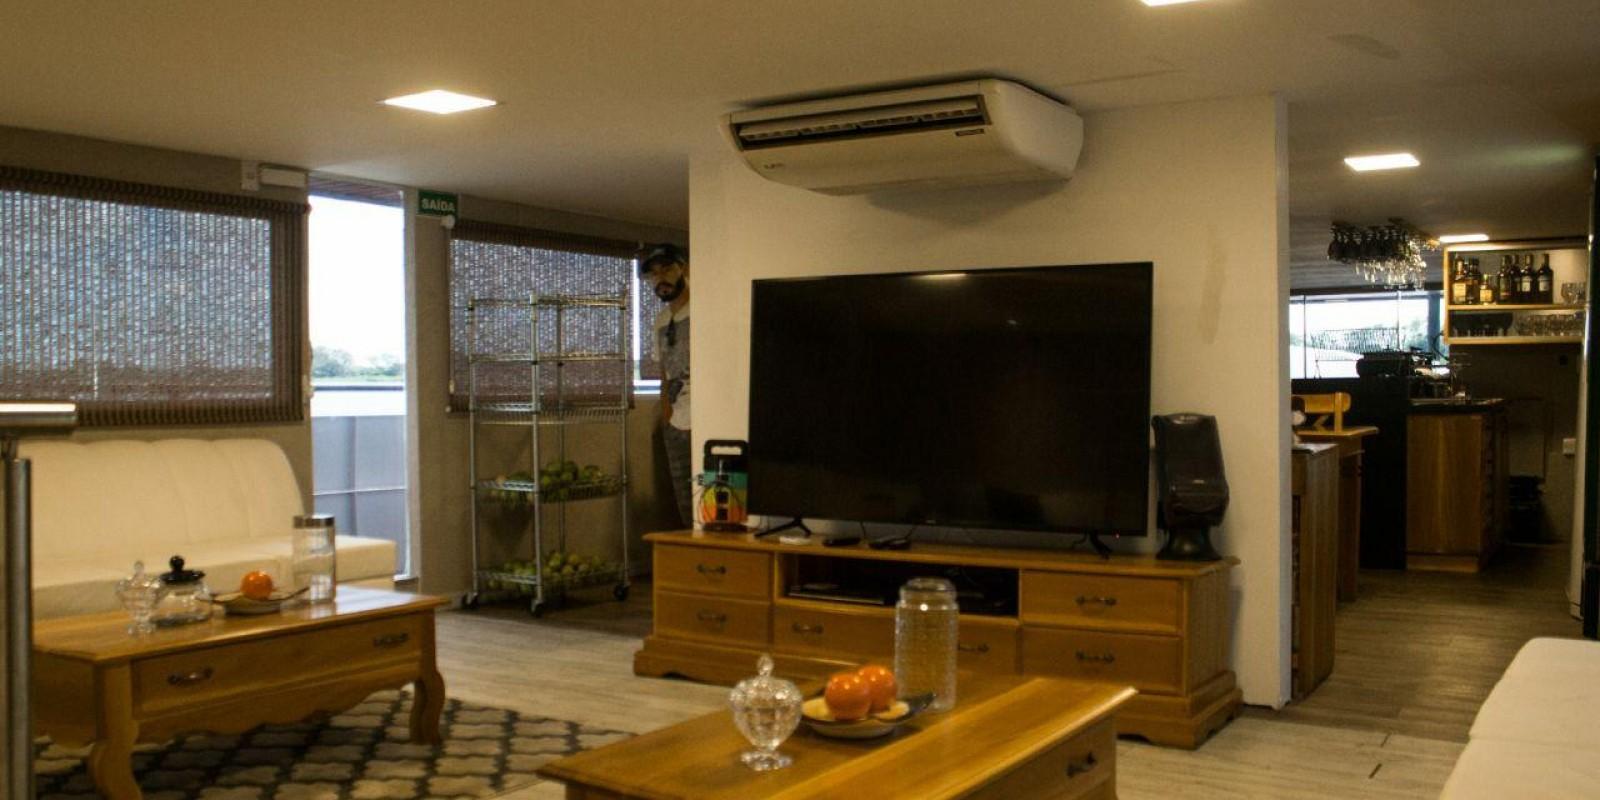 Barco Hotel Netuno - Corumbá - 24 pessoas - Foto 1 de 15